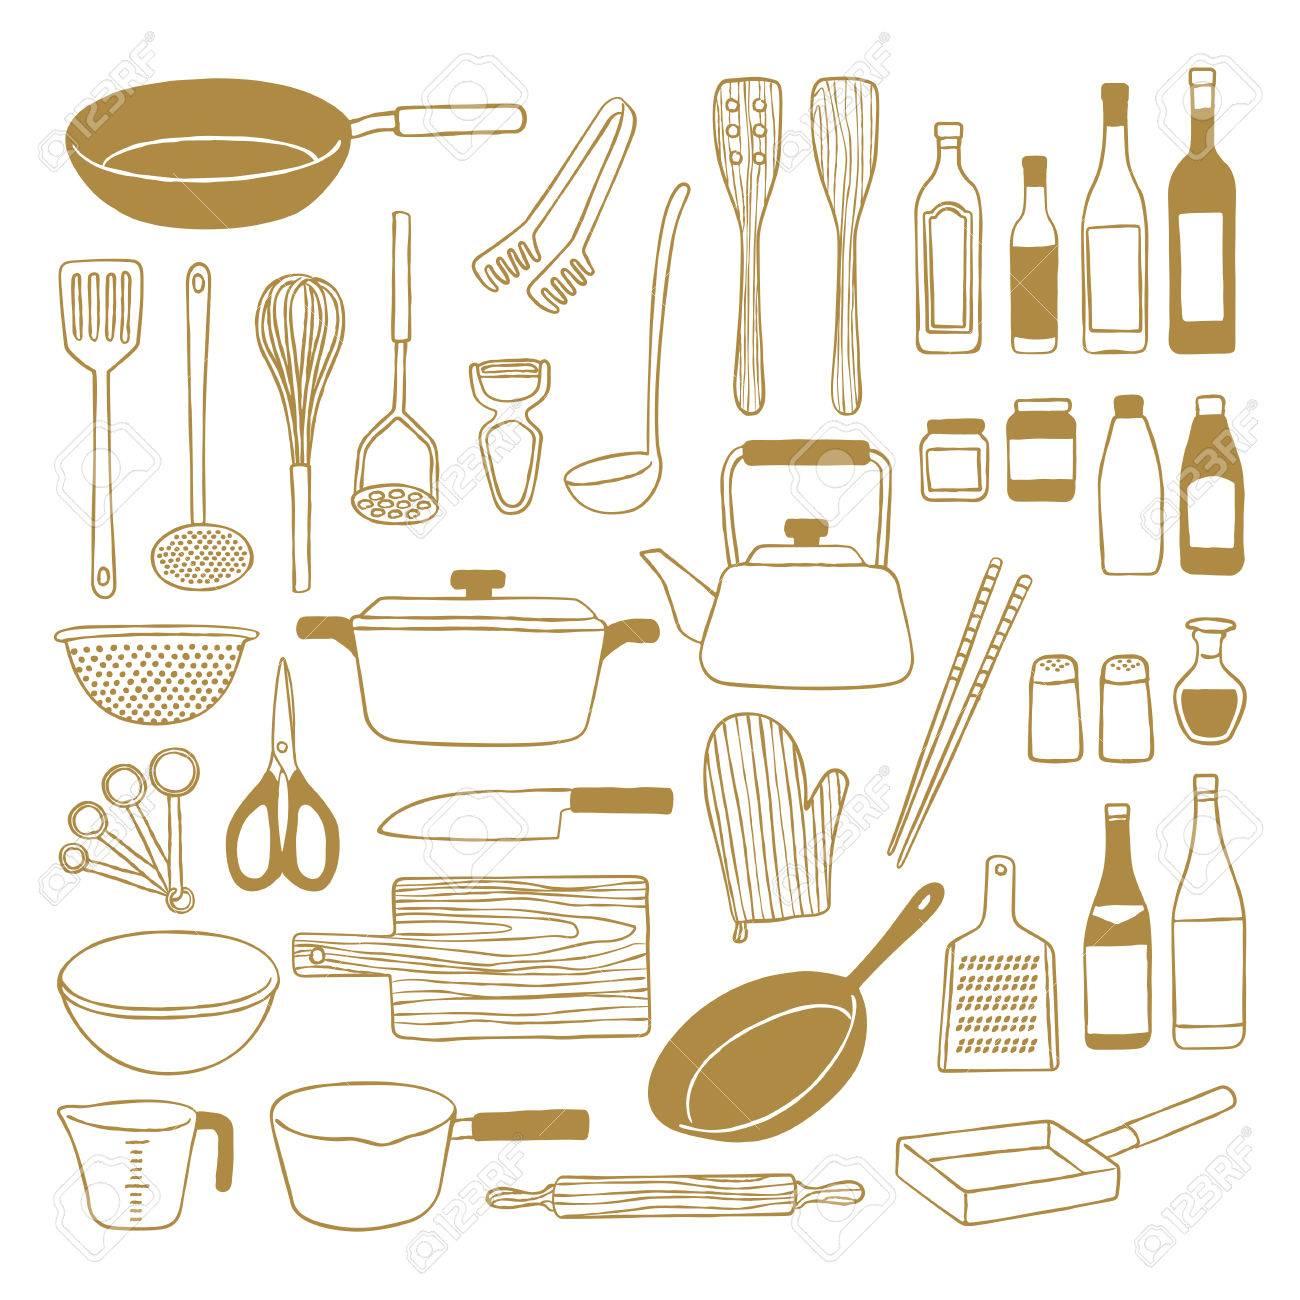 Kitchenware - 68723340